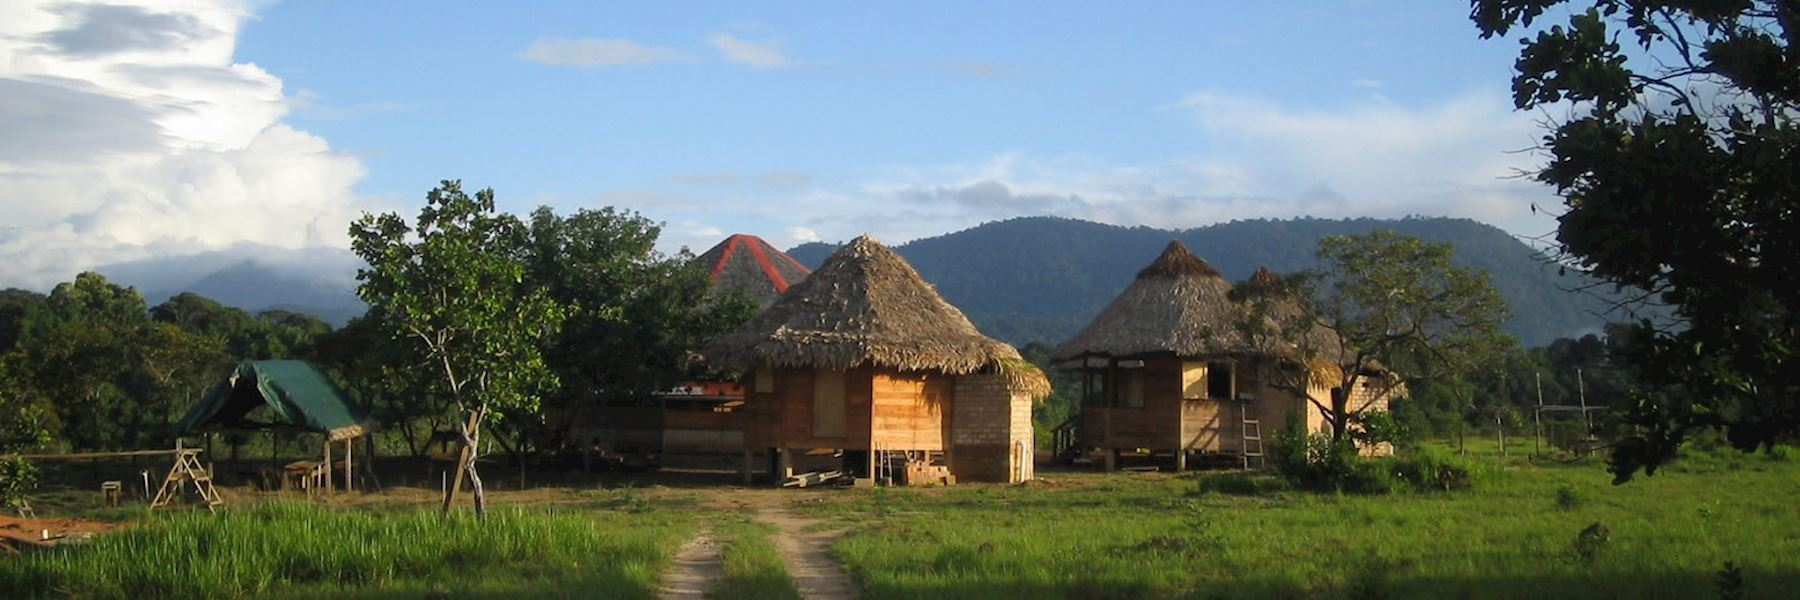 Visit Surama, Guyana